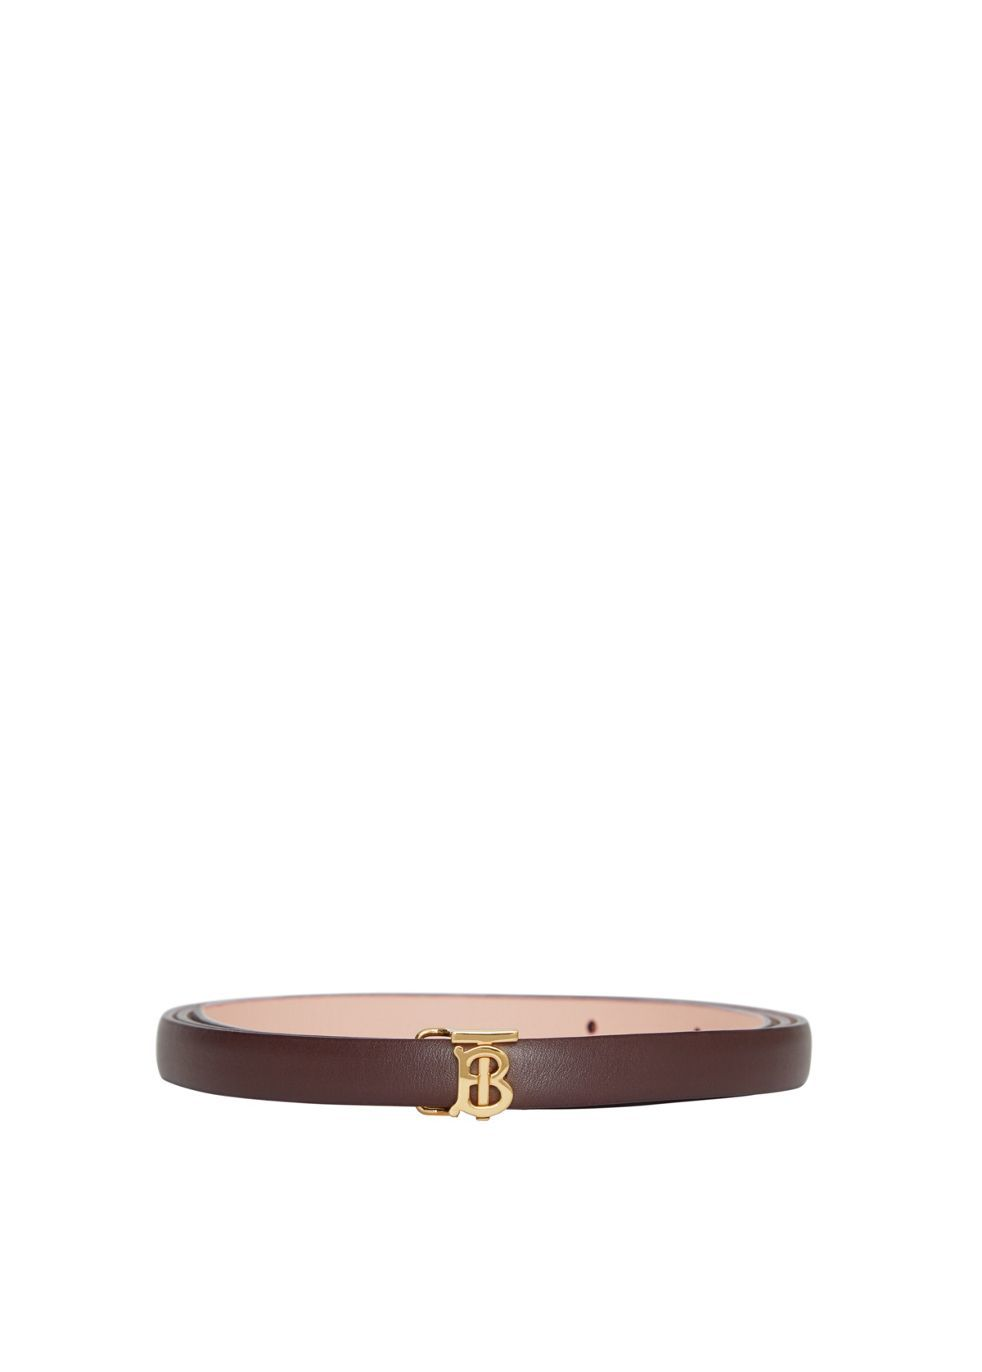 dd3acfac29f6 Women s Designer Belts - Leather   Studded - Harvey Nichols